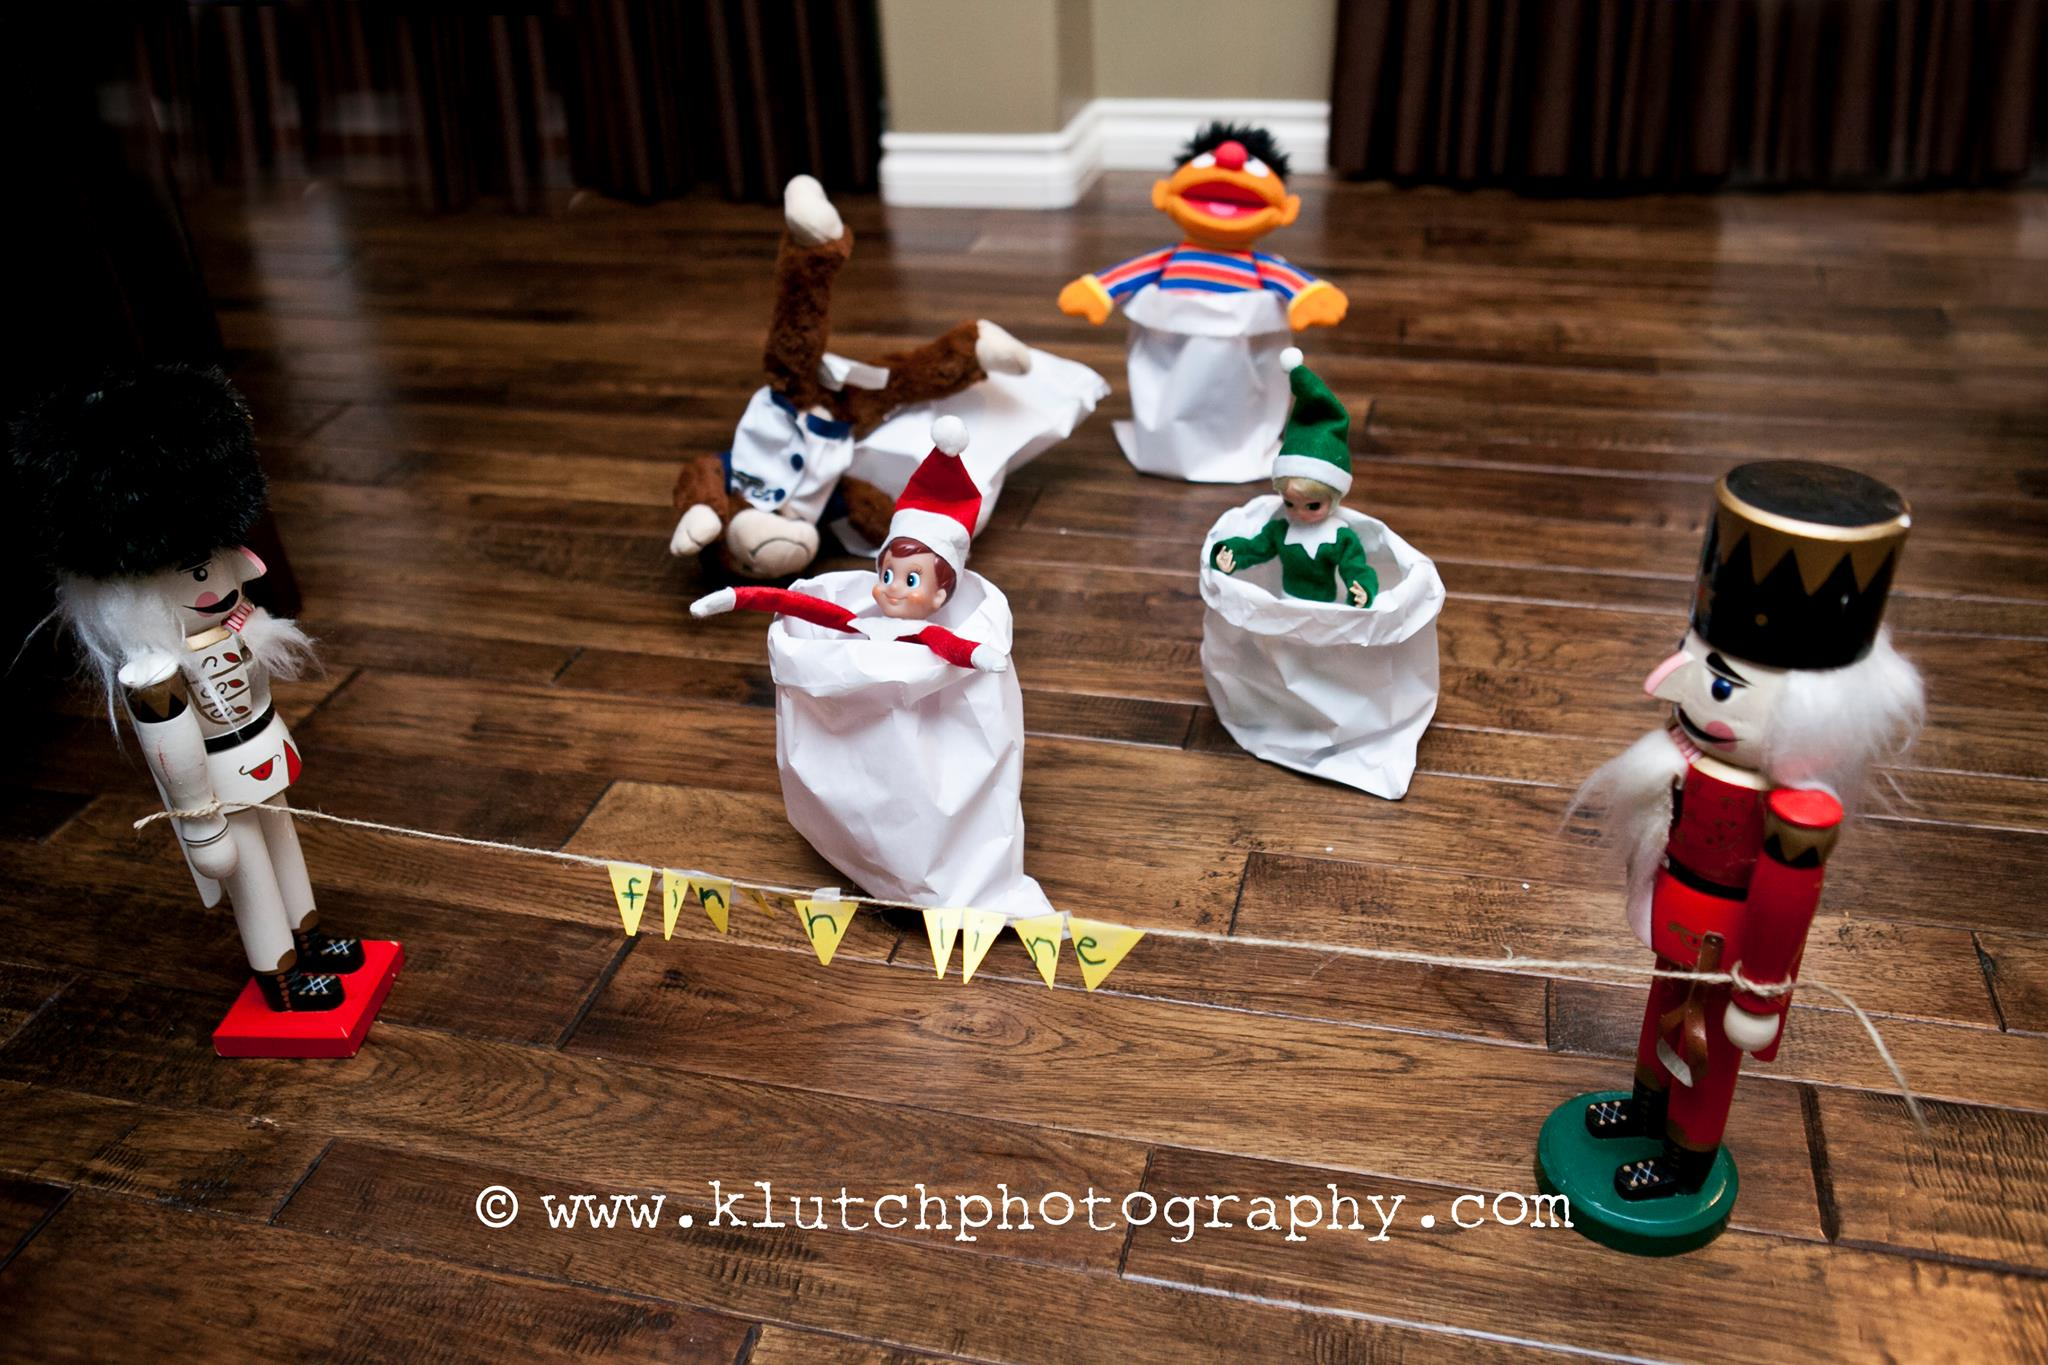 Klutch Photography, family photographer, elf on the shelf, vancouver family photographer, whiterock family photographer, lifeunscripted photographer, lifestlye photographer mjpg.jpg